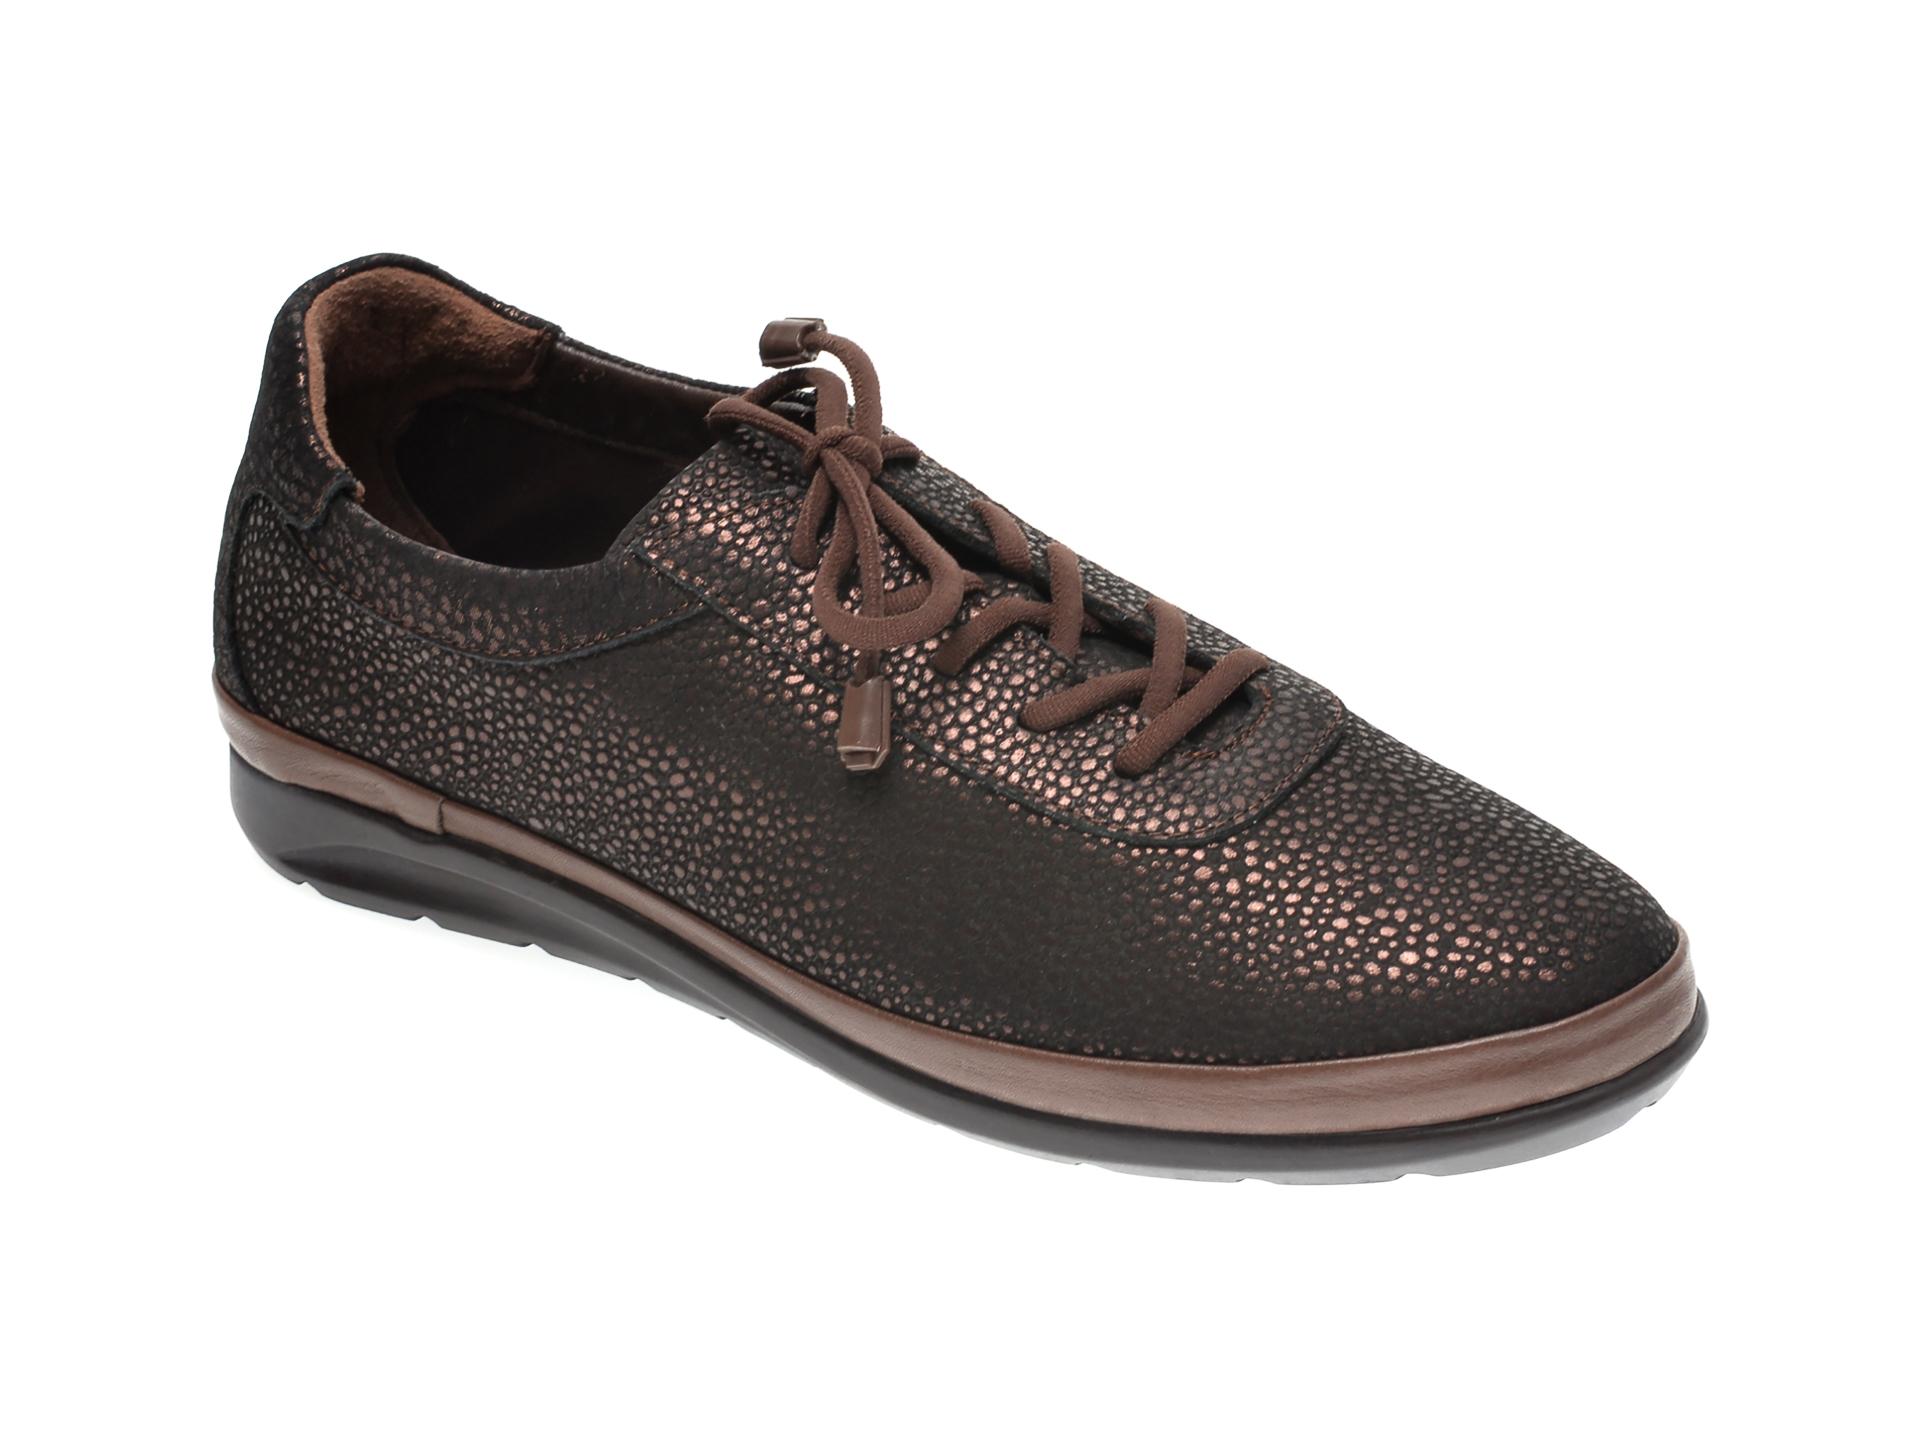 Pantofi ILOZ maro, 6354, din piele naturala imagine